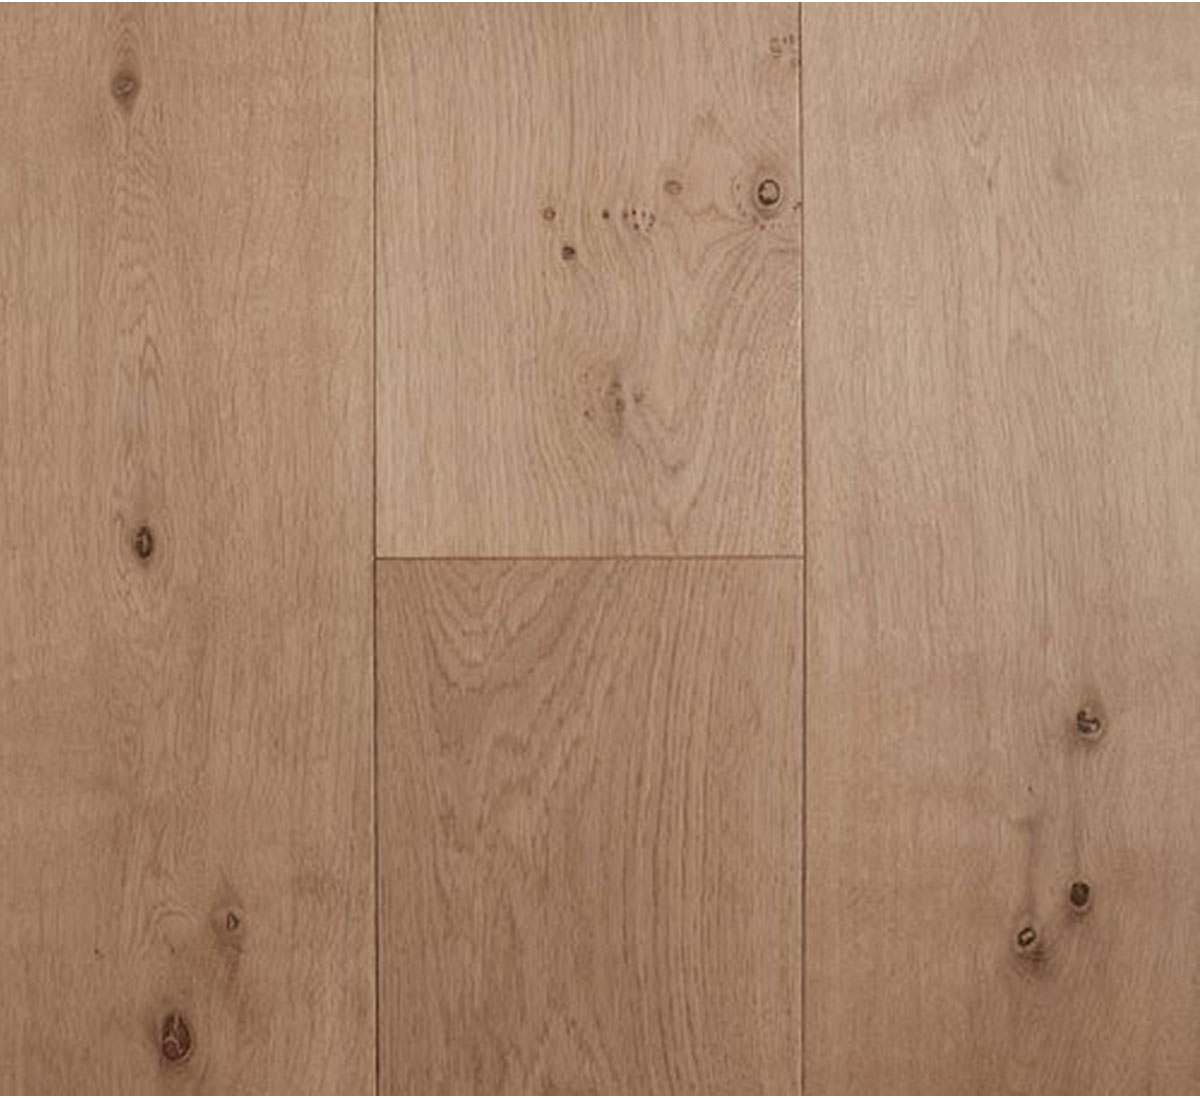 Prestige Oak - Tan - 15mm Engineered Timber Flooring - Stone3 Brisbane